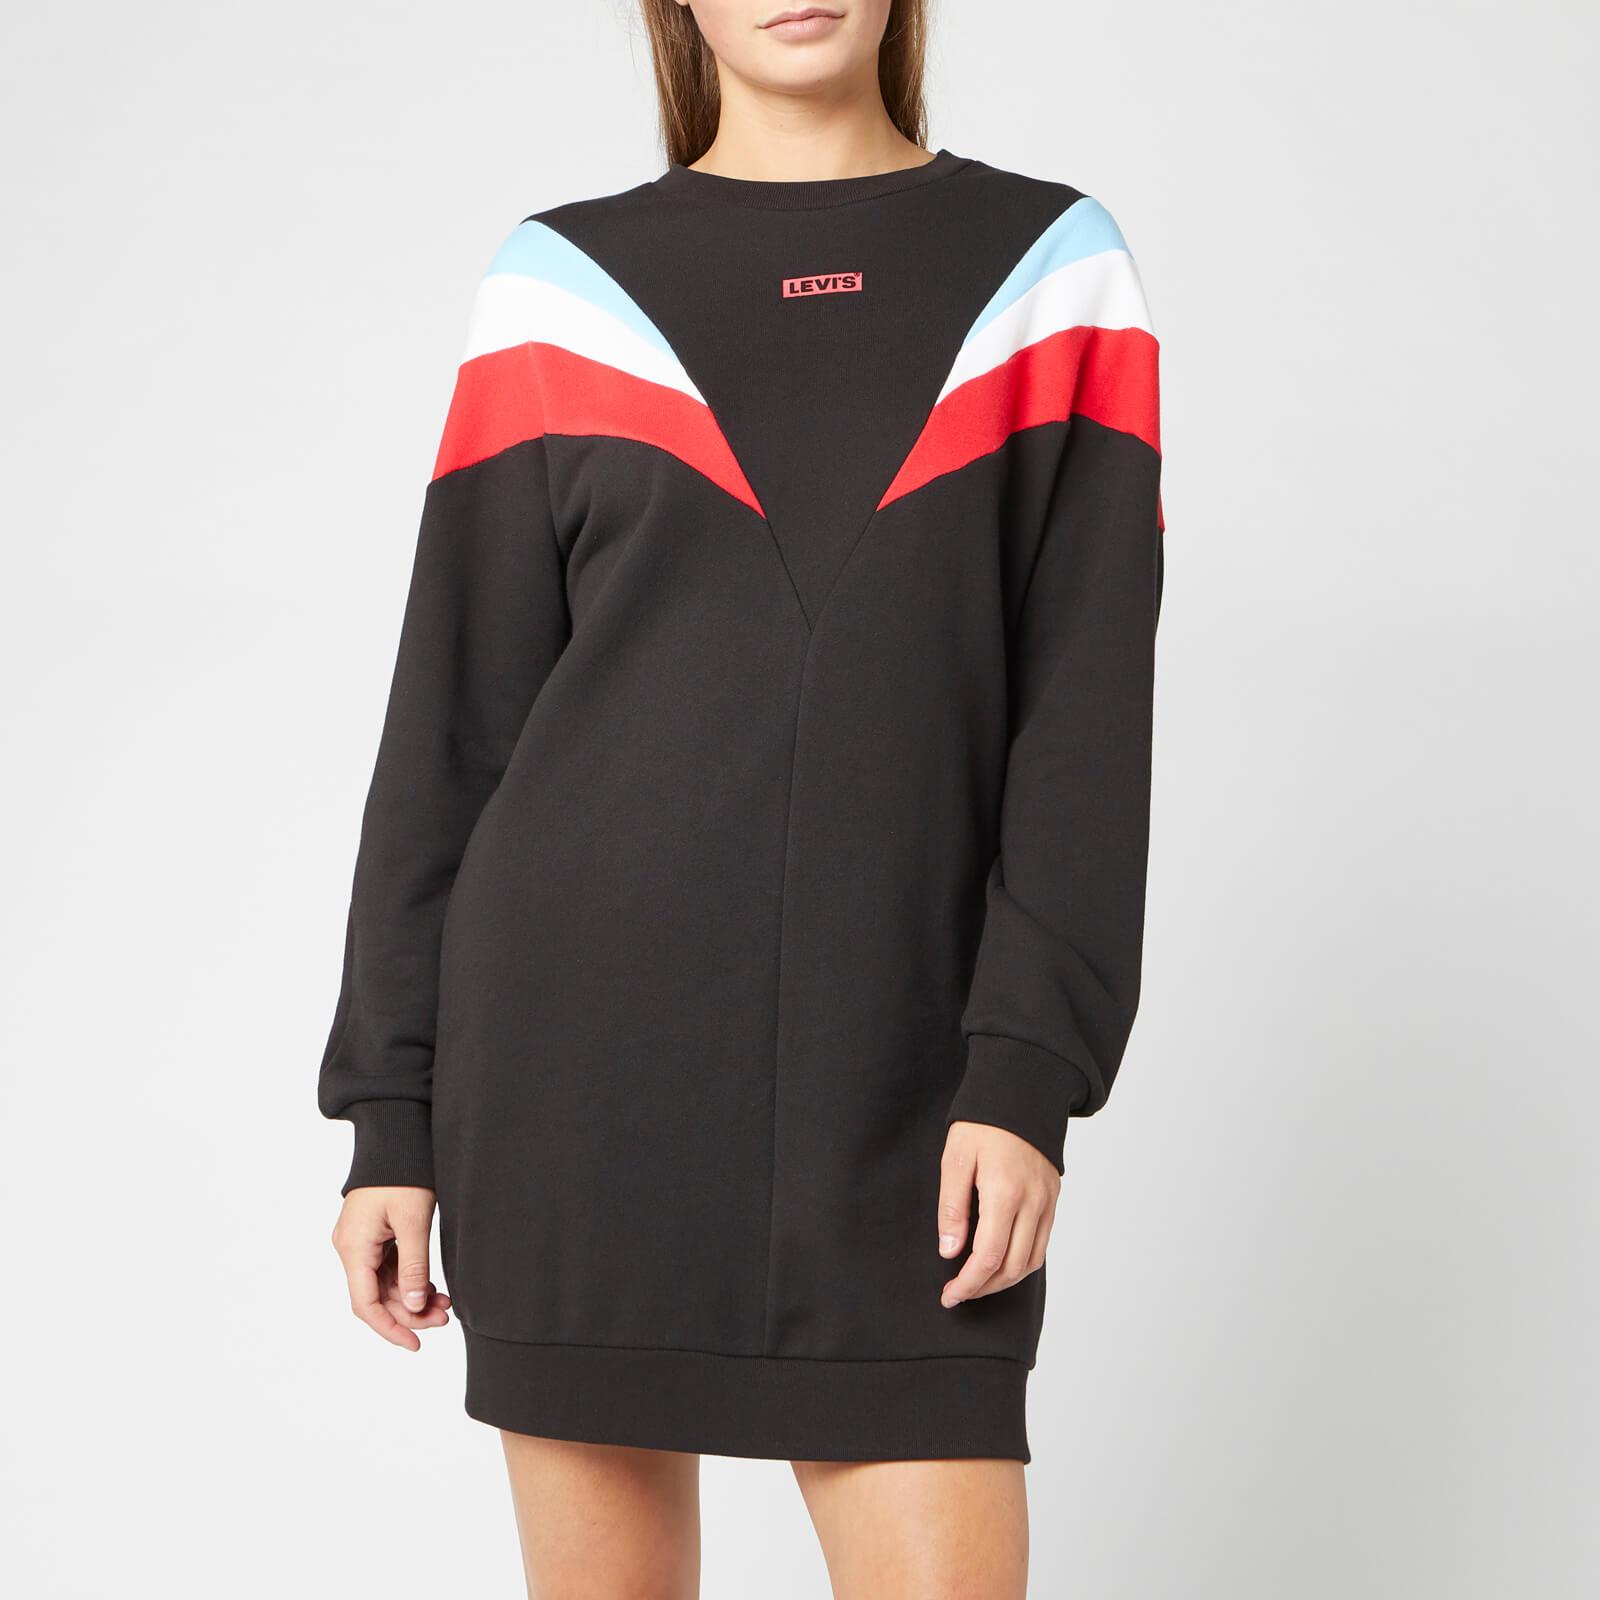 Levi's s Florence Crew Dress - Meteorite - XS - Black